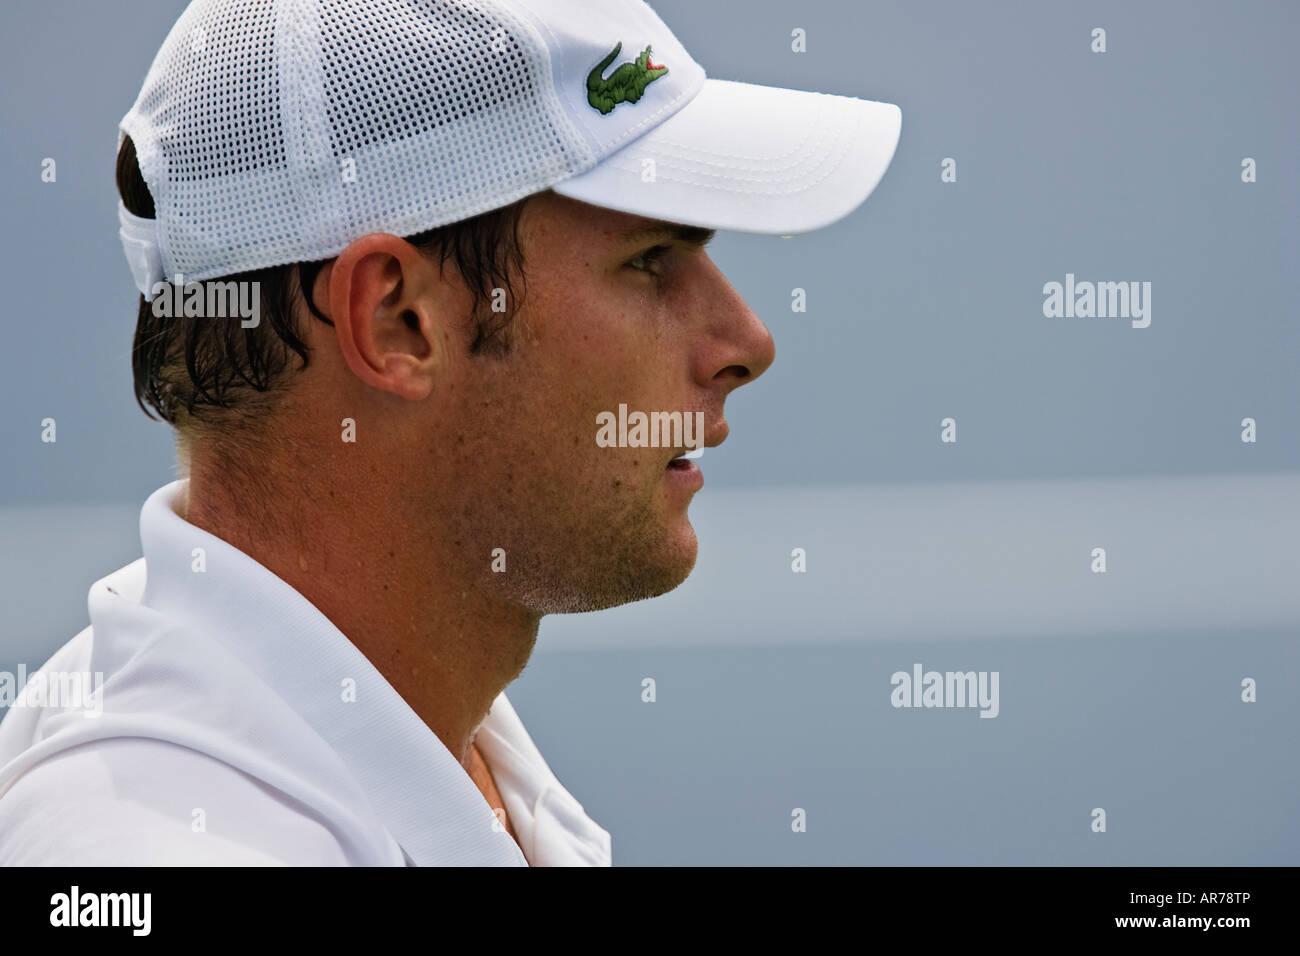 f370e1fe7cc583 Andy Roddick plays in the Cincinnati Western and Southern ATP Tennis  tournament in Cincinnati Ohio.